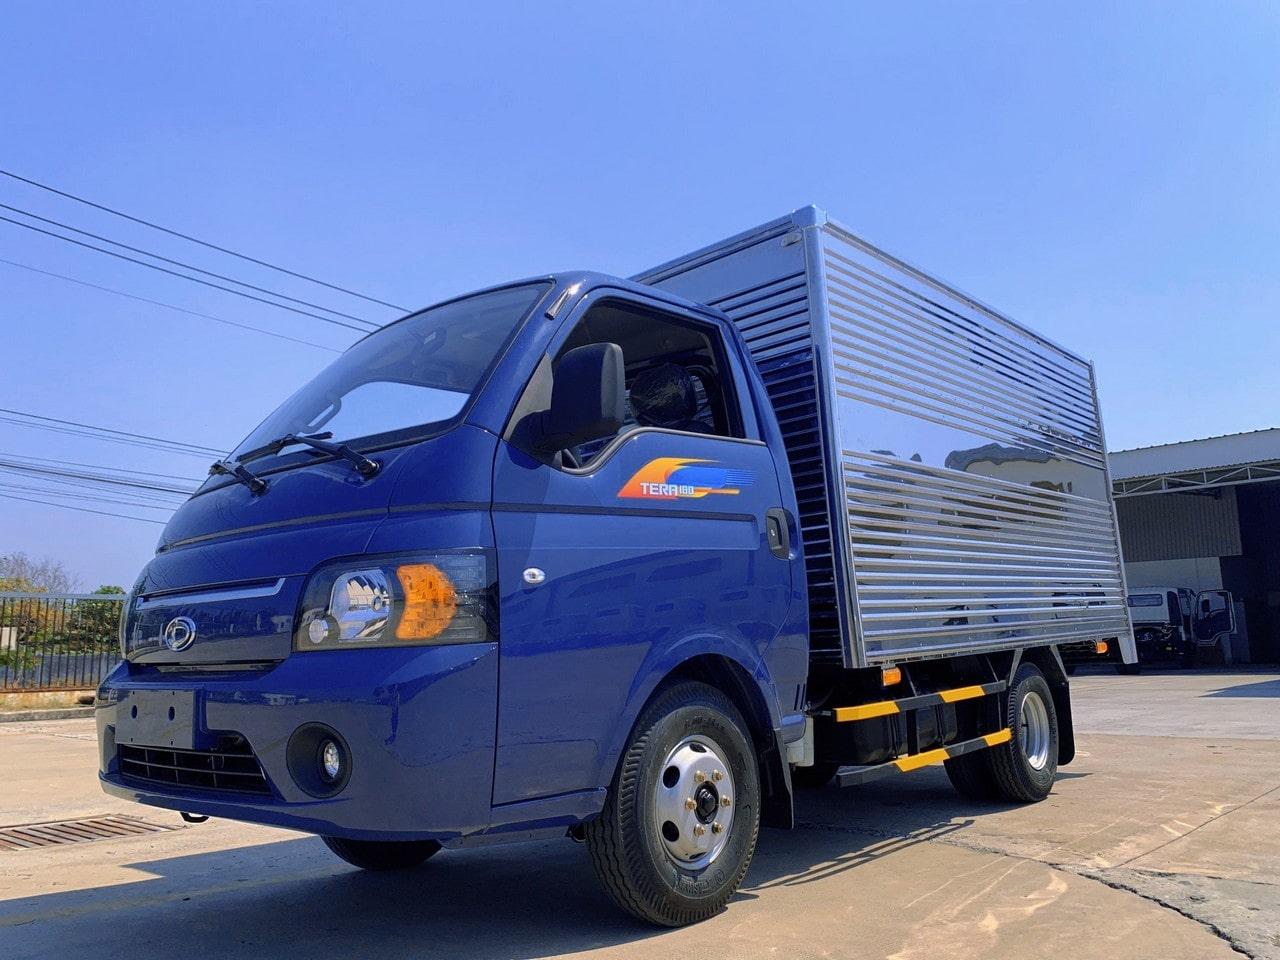 xe tải Teraco 180